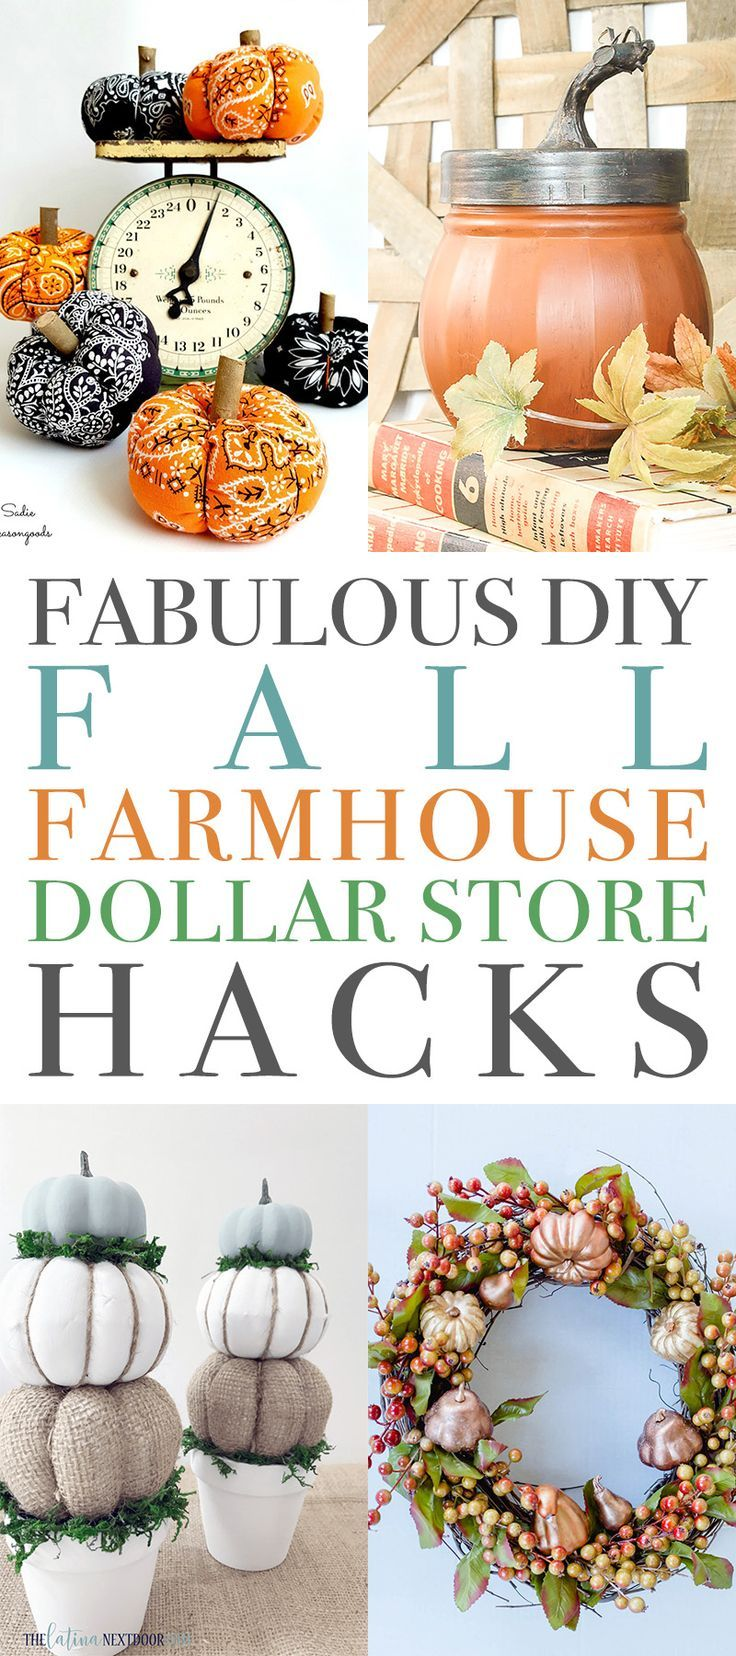 Fabuleux bricolage automne Farmhouse Dollar Store Hacks